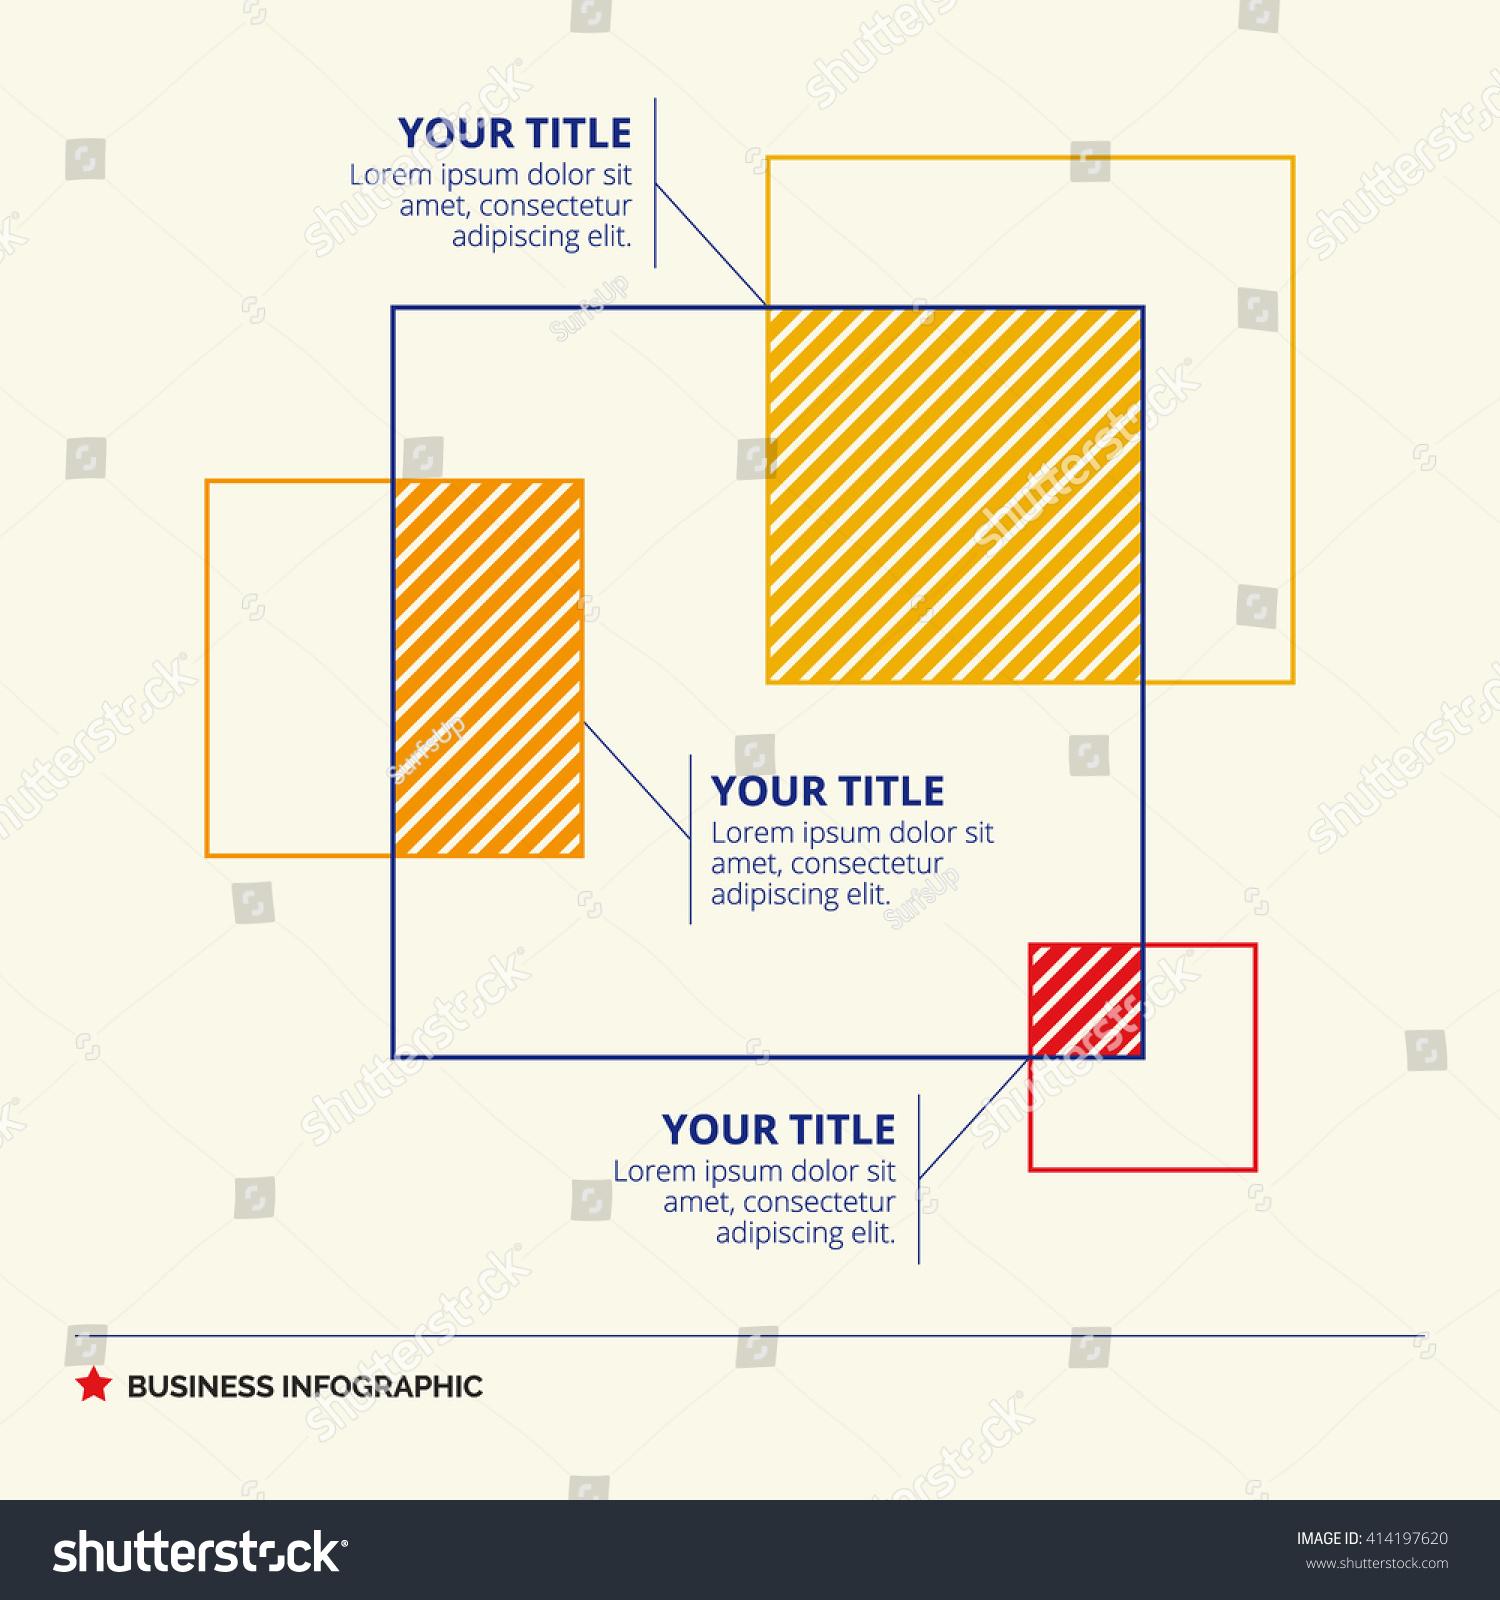 Venn diagram template stock vector 414197620 shutterstock venn diagram template pooptronica